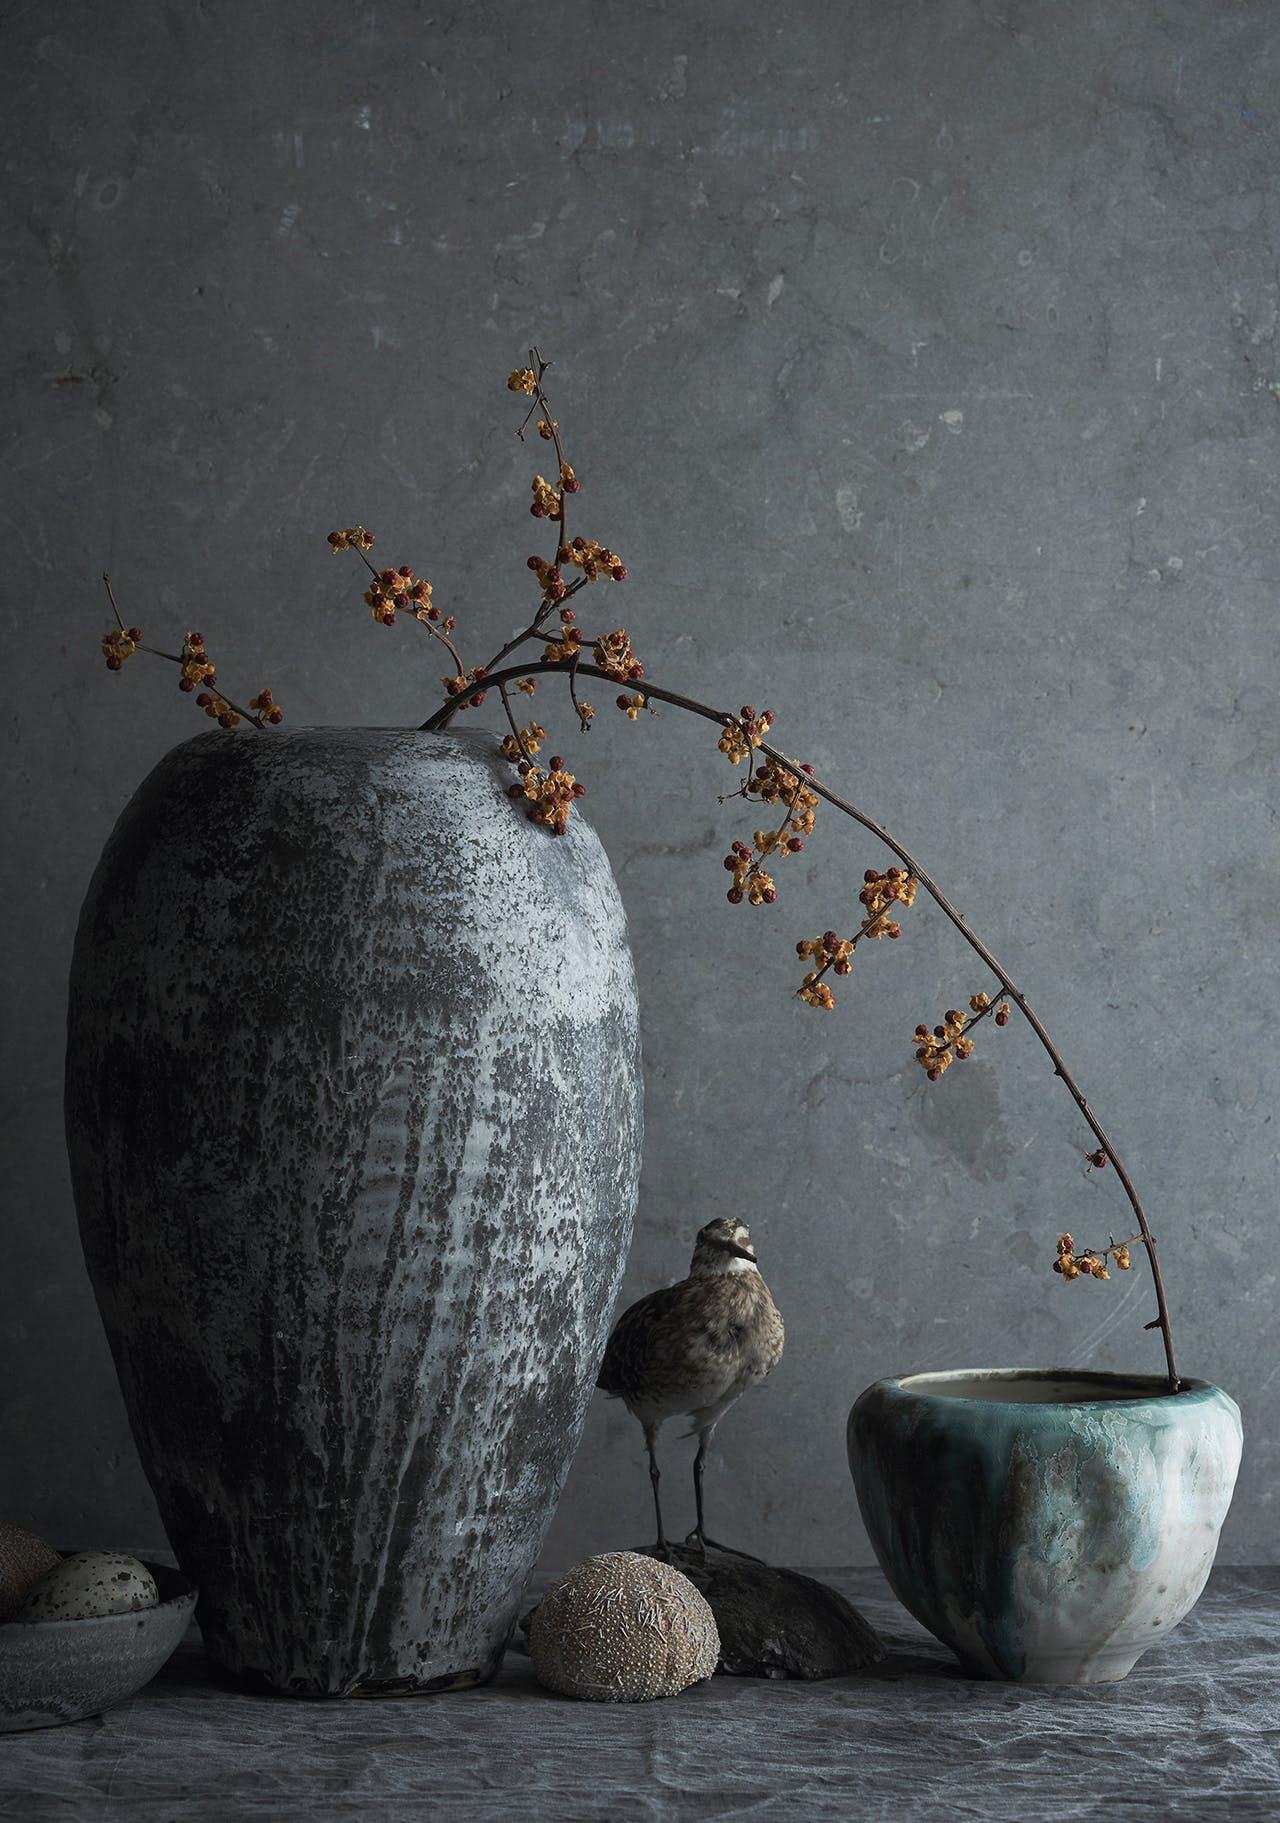 stentøj fugl dekoration stilleben